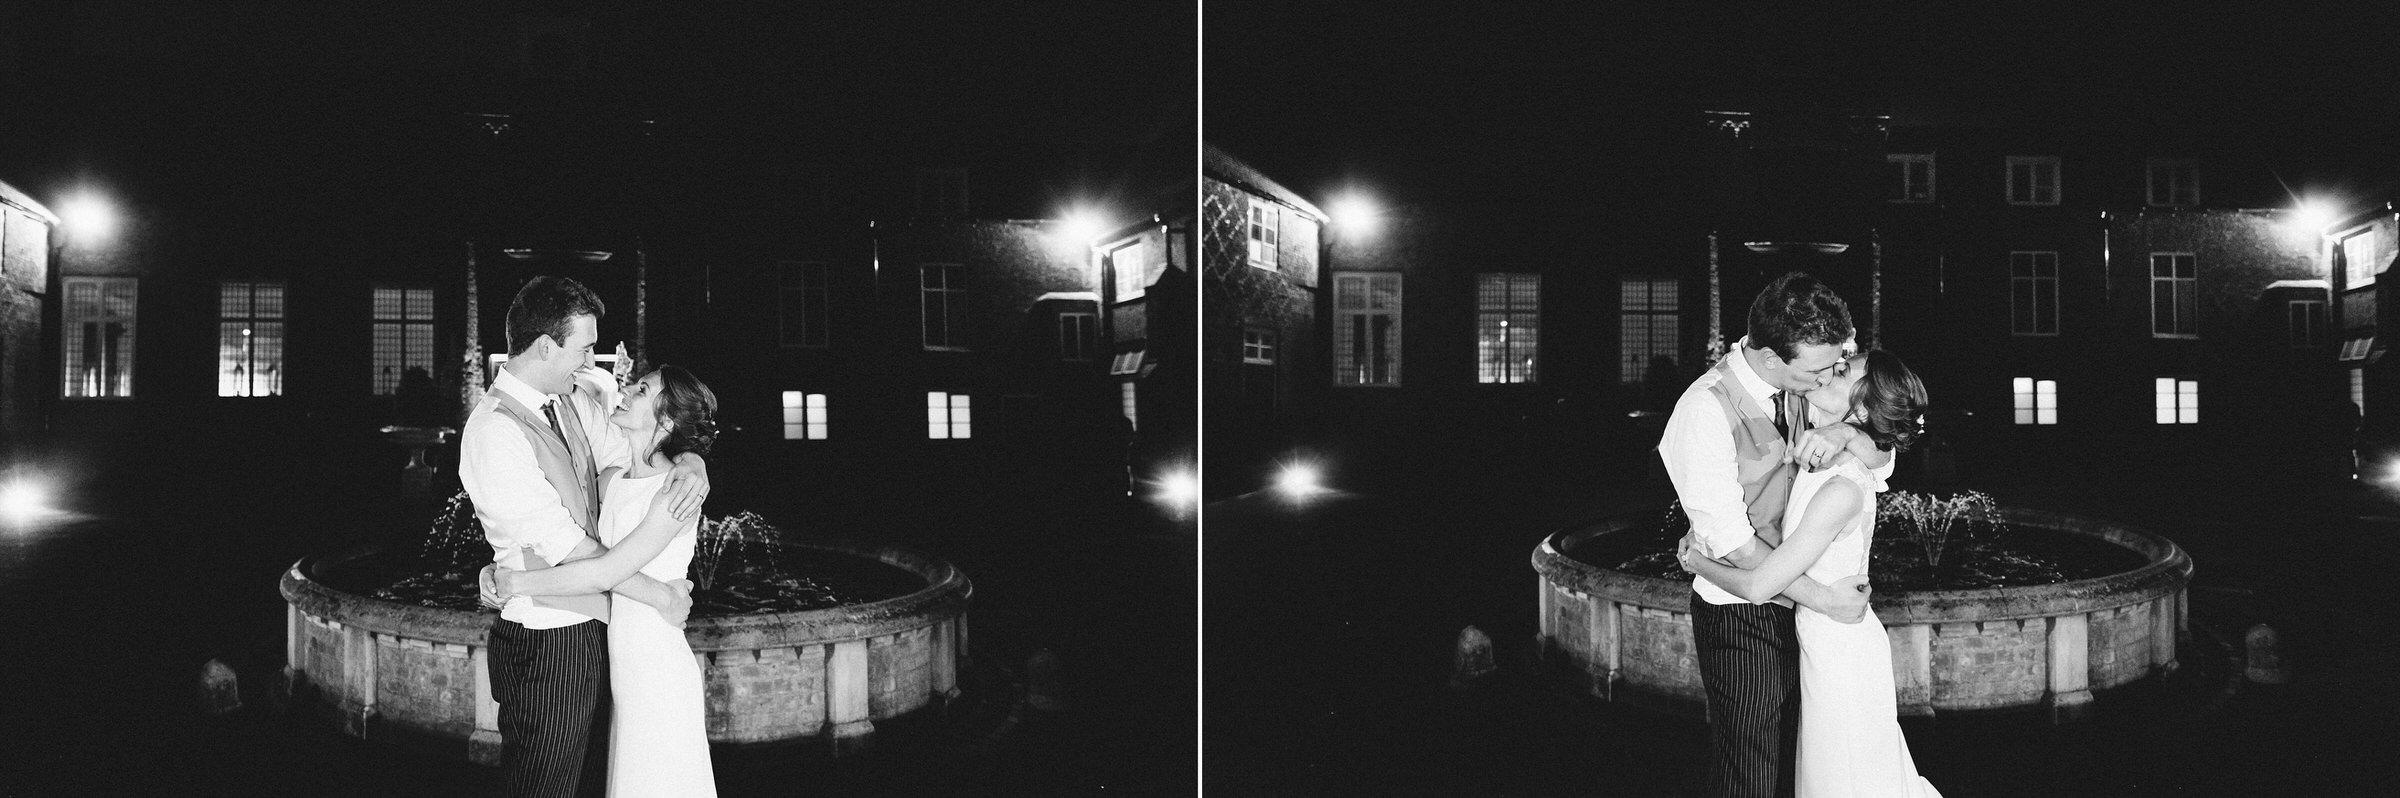 Fulham Palace night portraits